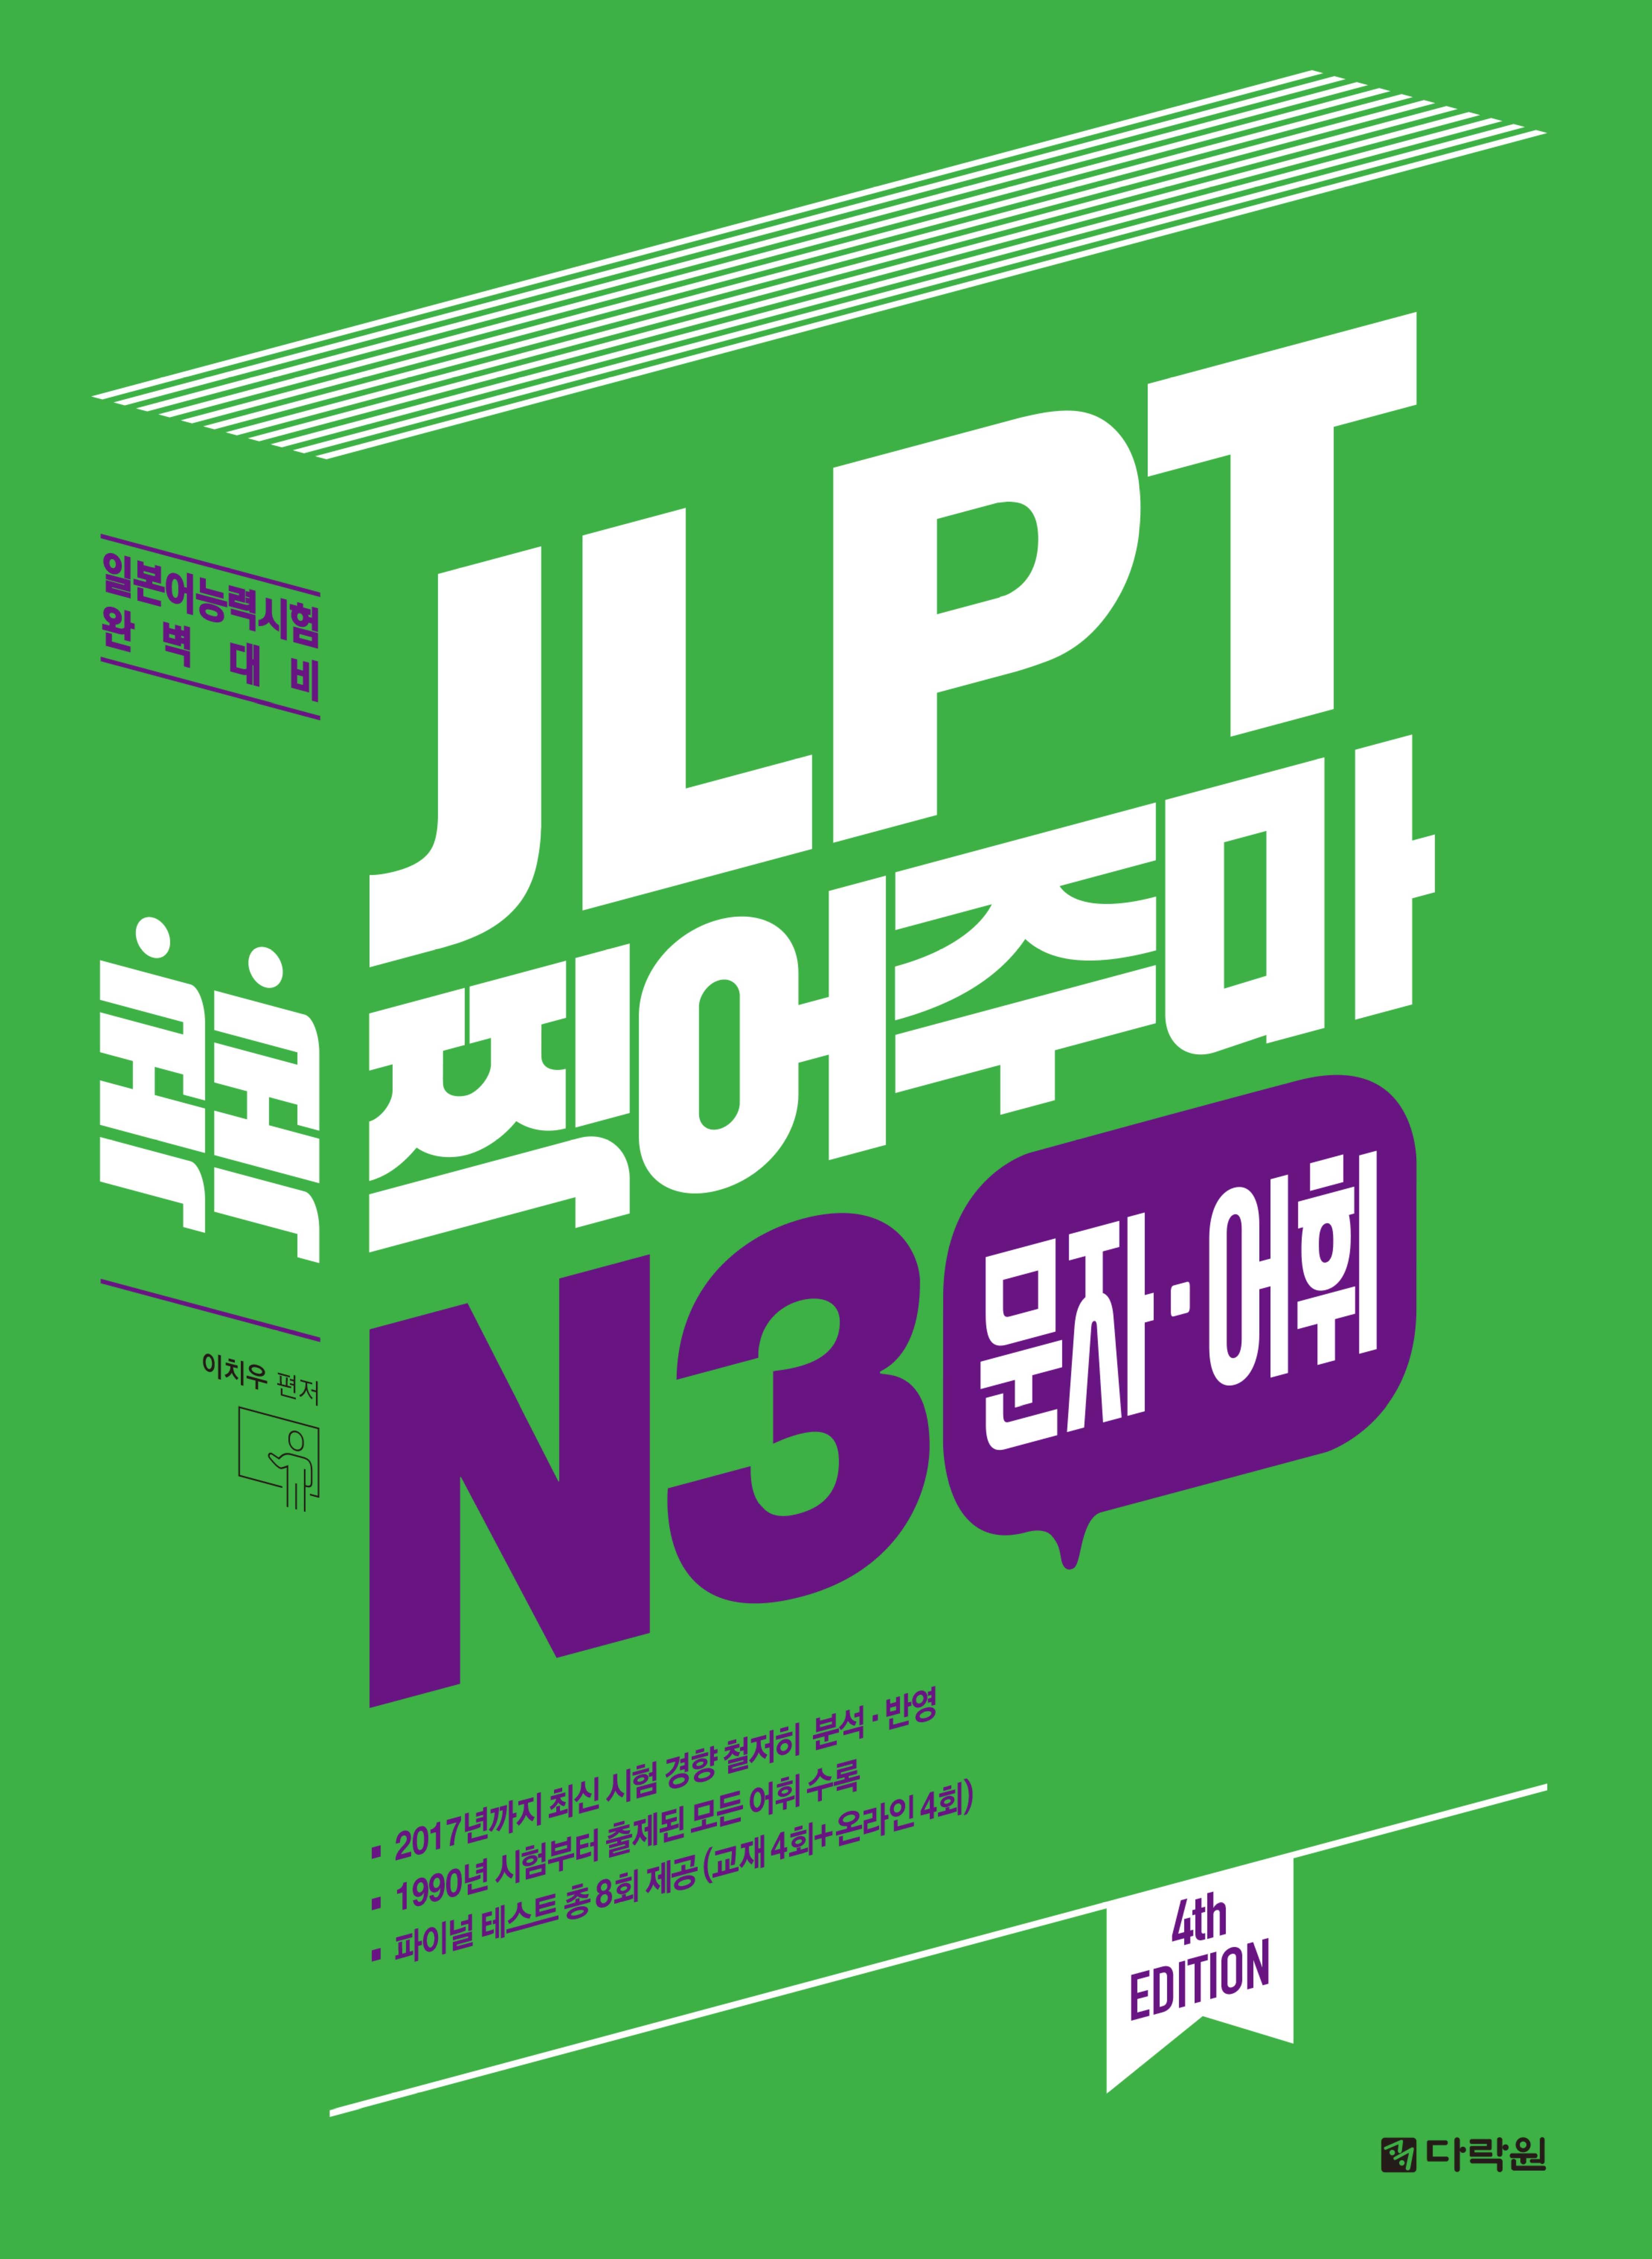 [JLPT 콕콕 찍어주마] (4th EDITION) JLPT 콕콕 찍어주마 N3 문자·어휘